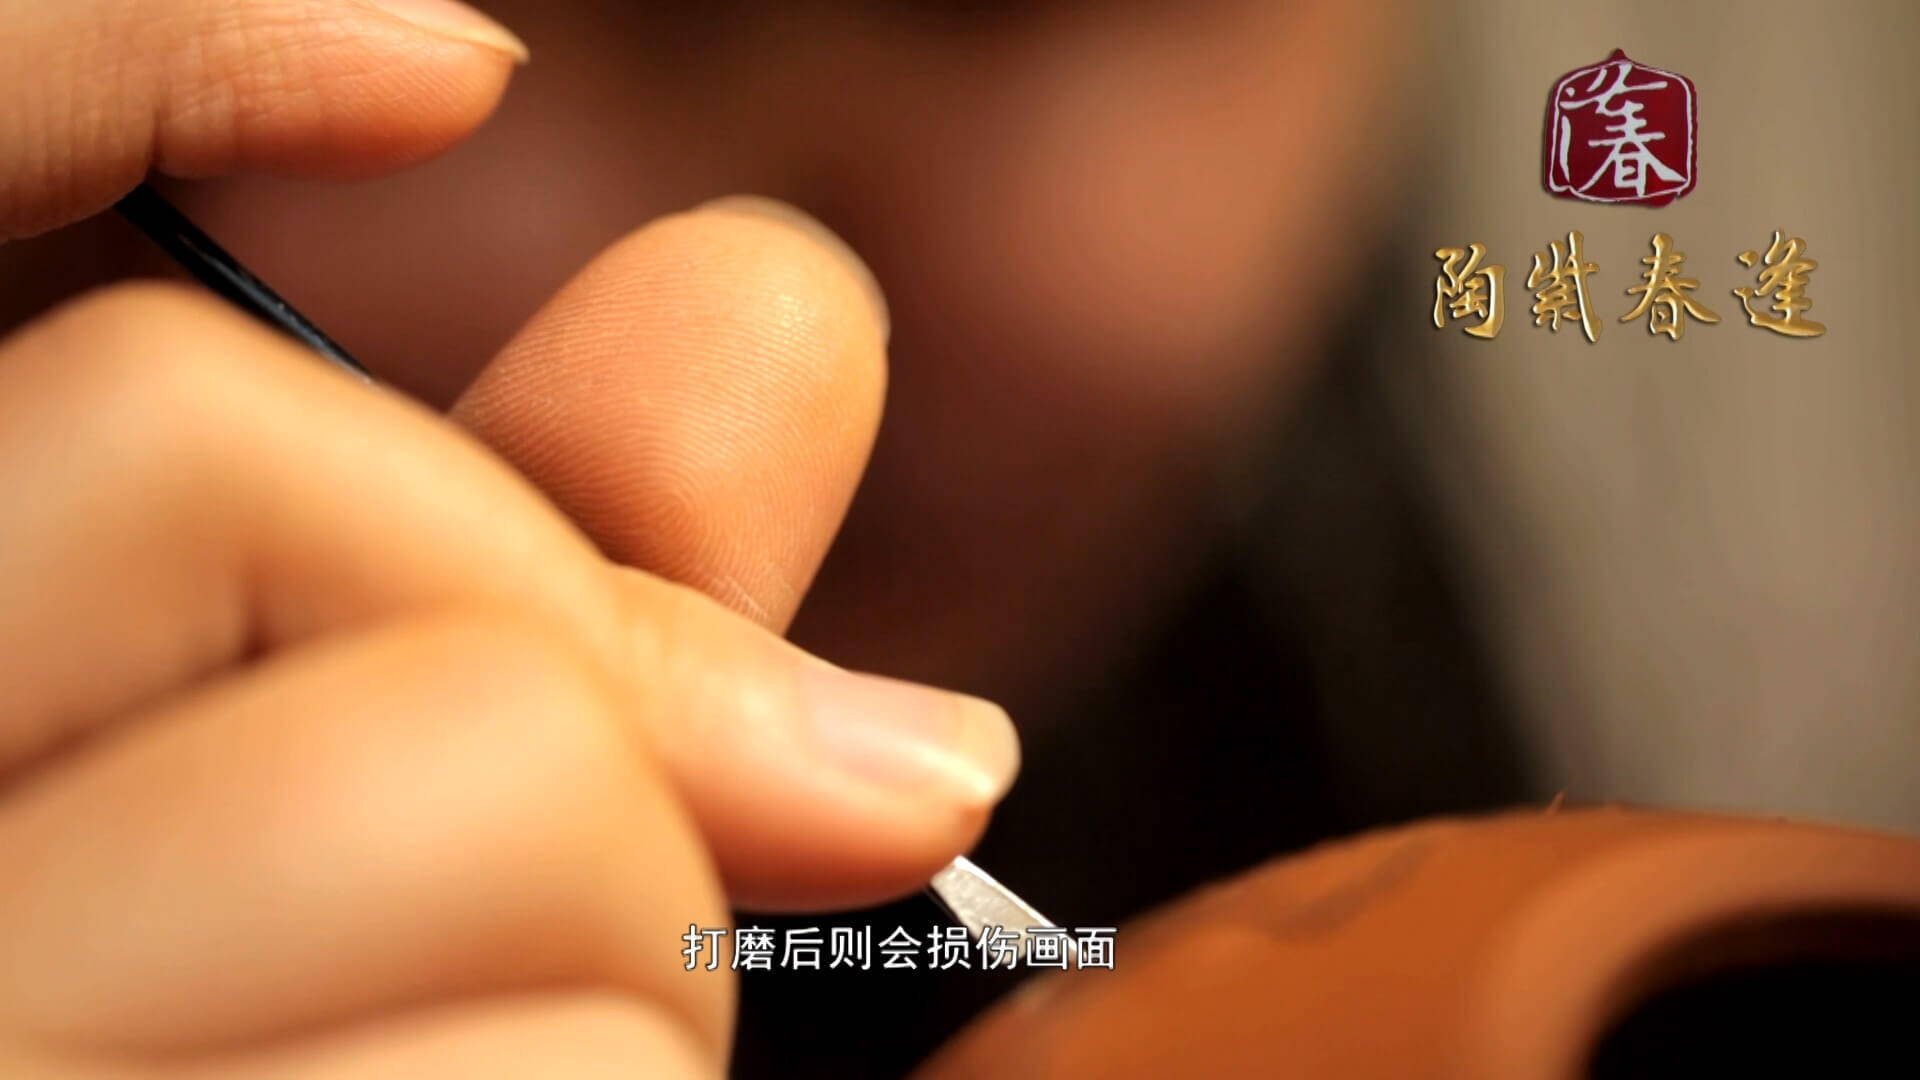 Creating Jian Shui Pottery - Carving Tool